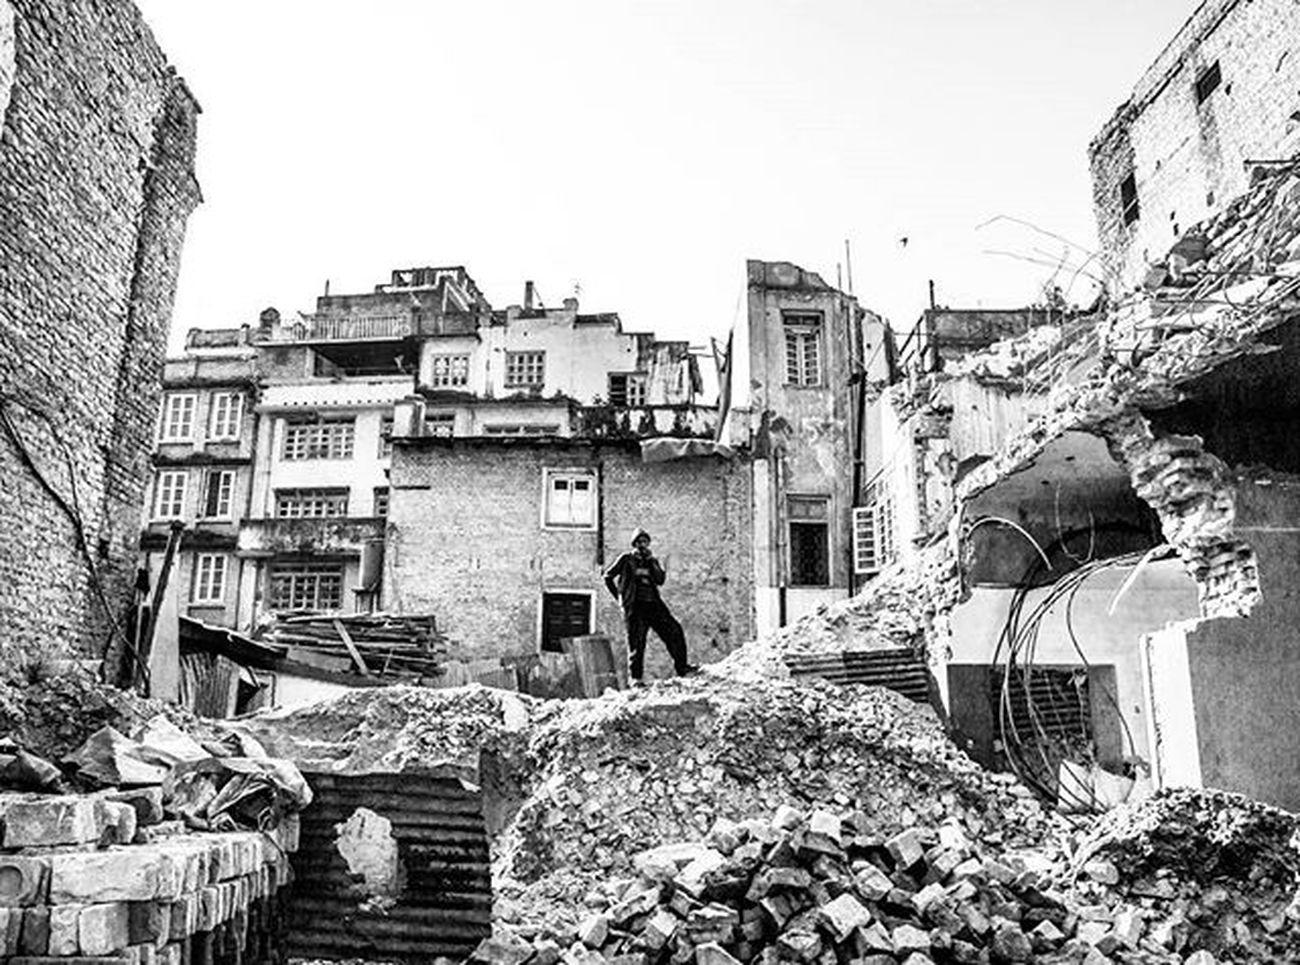 Basantapur, Kathmandu. November 12th. Street Streetphotography Kathmandu Nepal Nepalphotoproject Earthquake Nepalearthquake Urban Nikon1j1 Blackandwhite Blackandwhiteisworththefight Streetbwcolor Streetminimal Dktm @streets_kathmandu